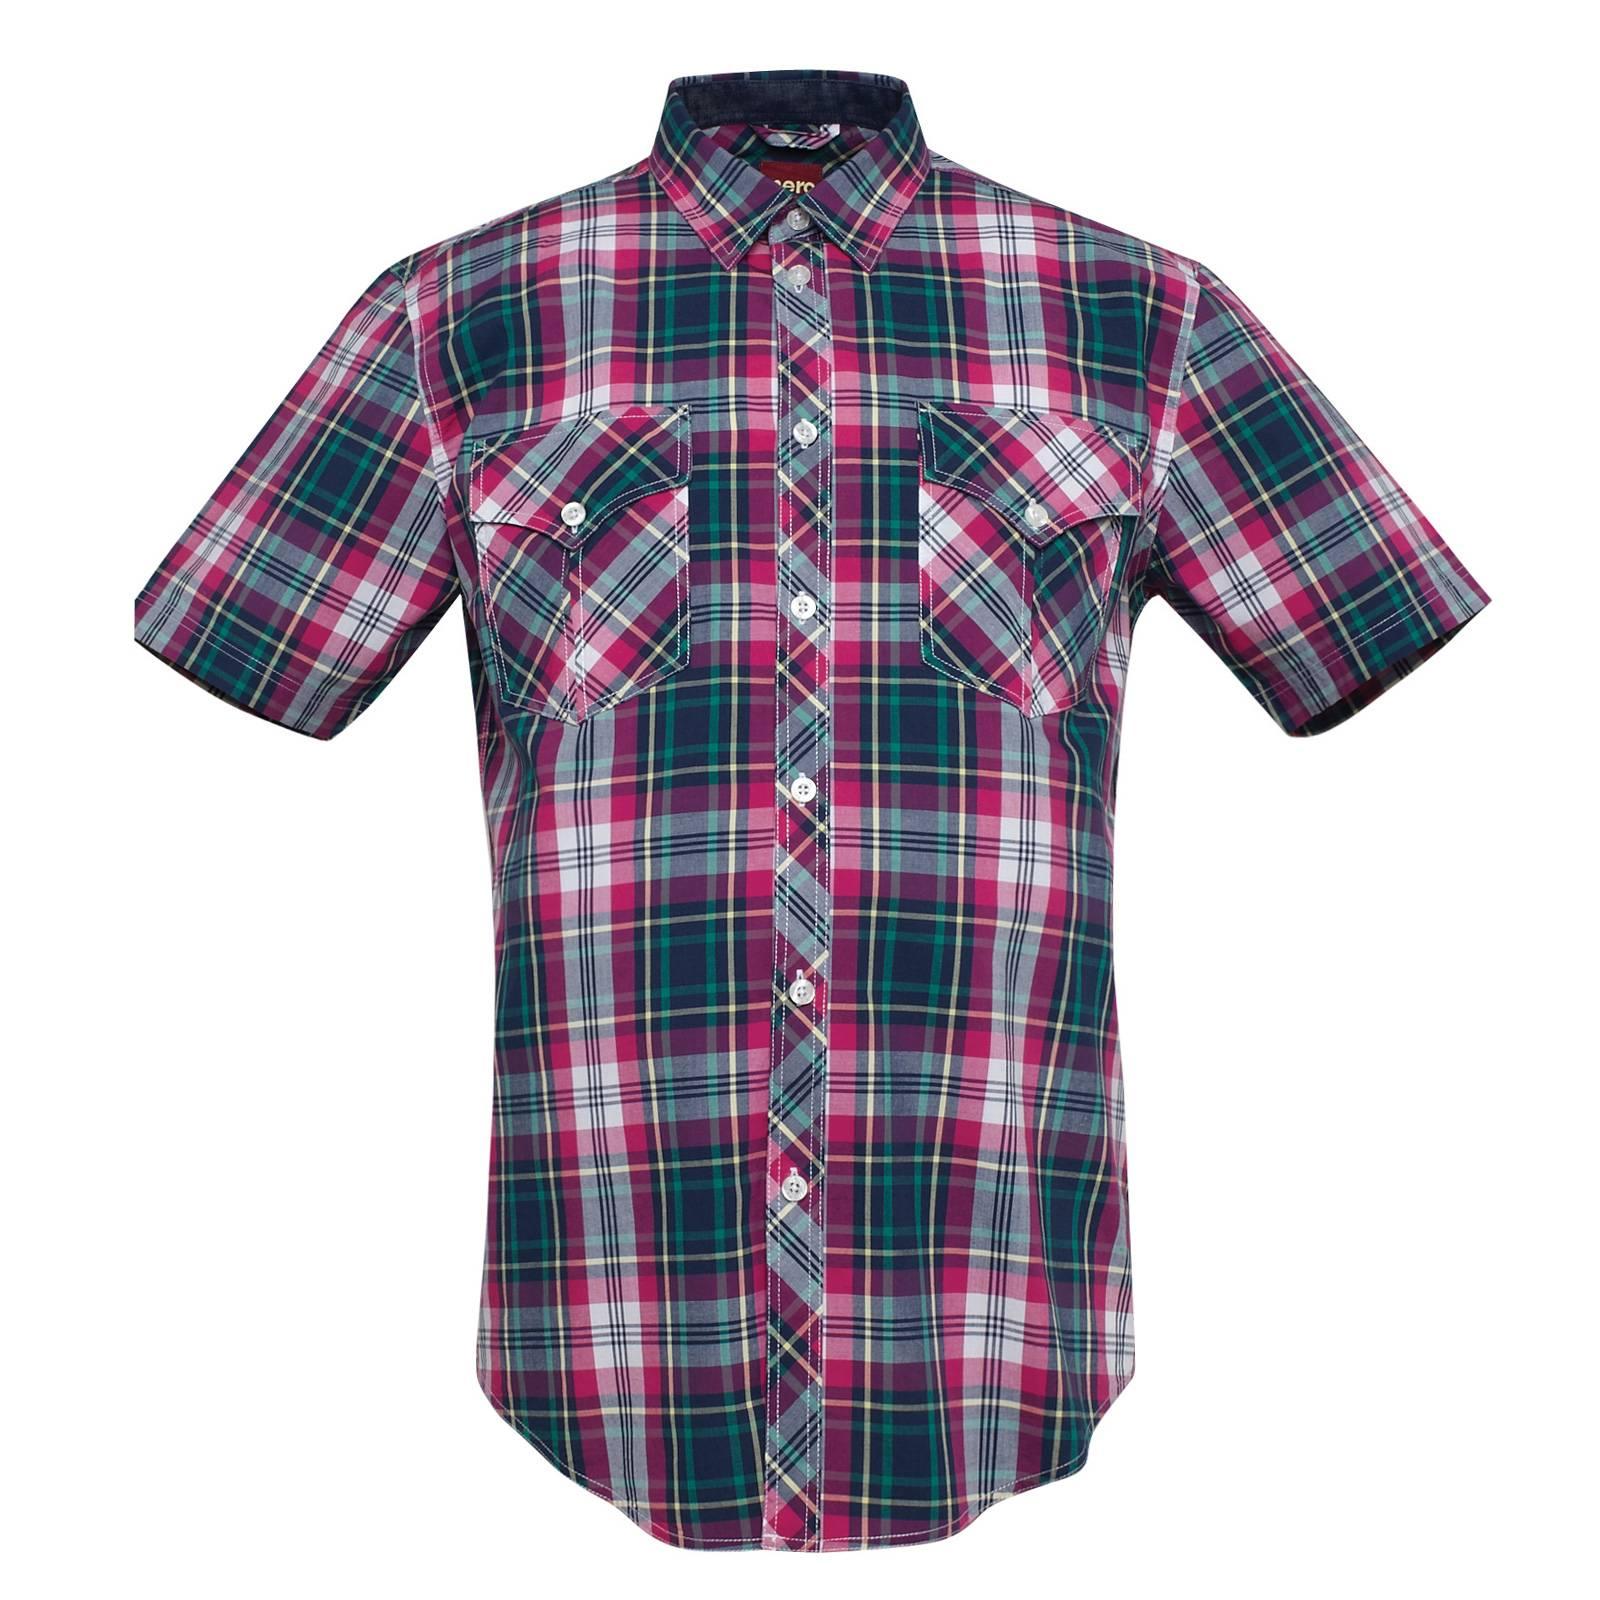 Рубашка GrahamPre-Season Ultra Sale<br><br><br>Артикул: 1512112<br>Материал: 100% хлопок<br>Цвет: розовый<br>Пол: Мужской